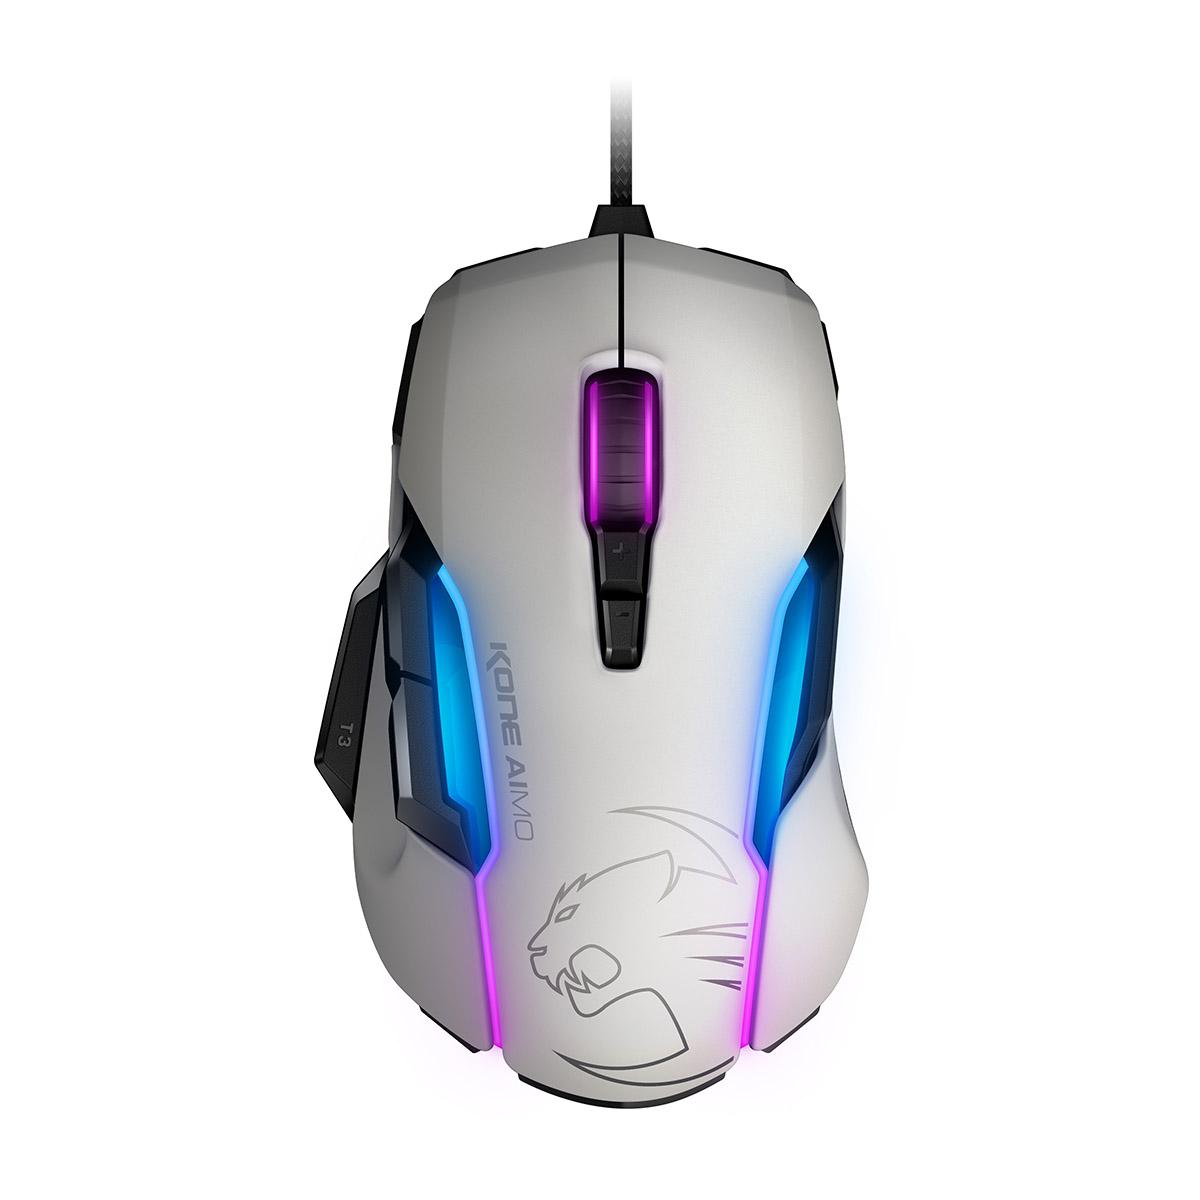 Roccat, KONE, AIMO, RGBA, Smart, Customization, Gaming, Mouse, (White, Version), MOD:, ROC-11-810-AS,